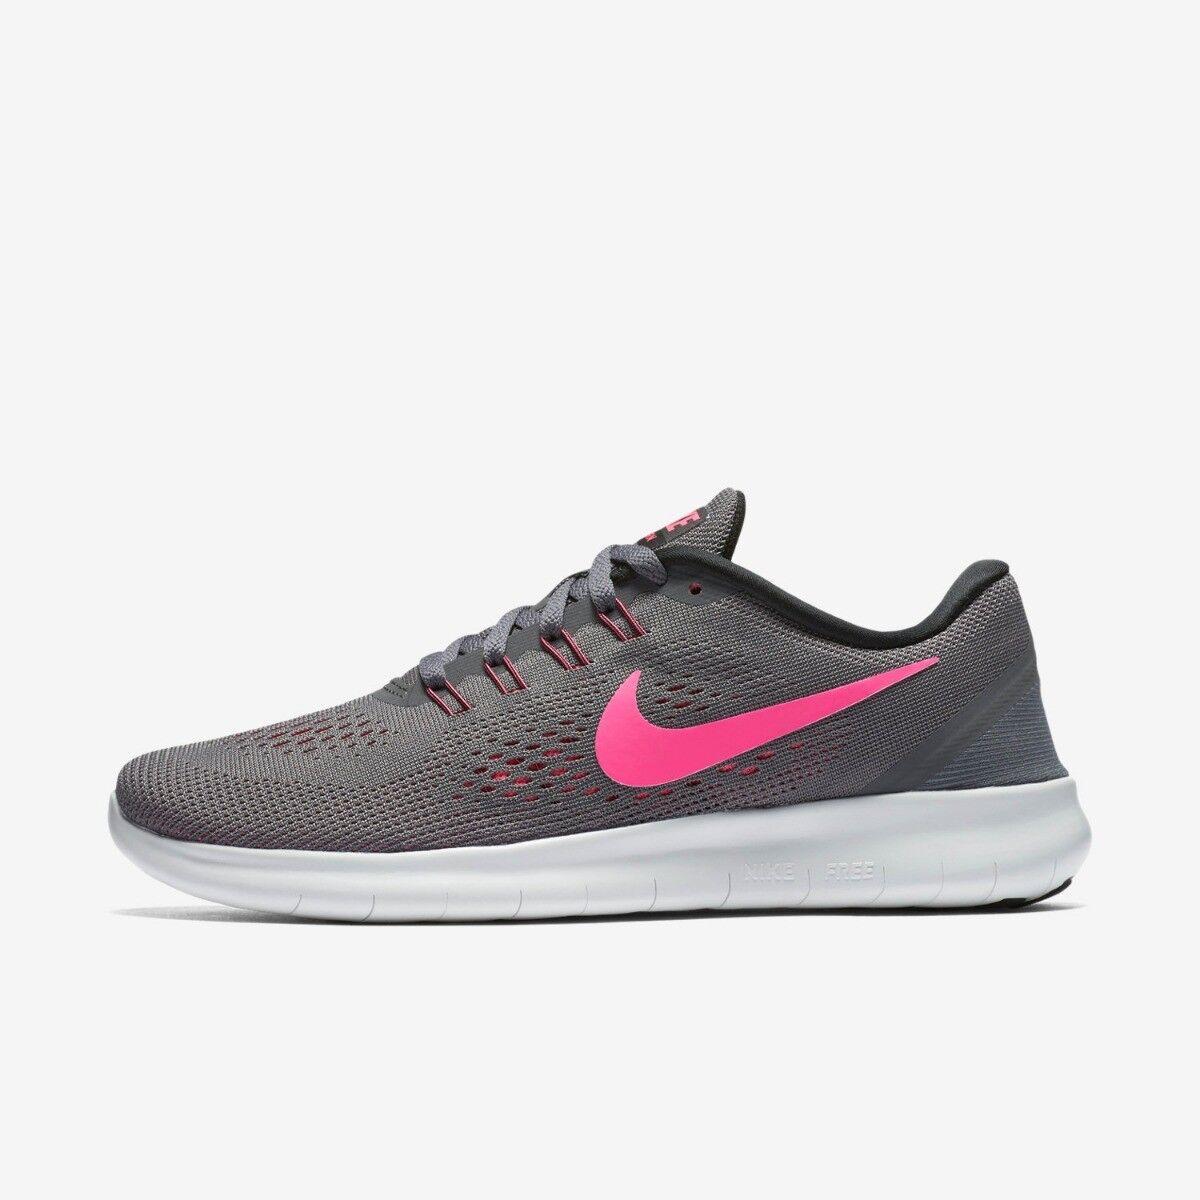 Nike pour femmes FREE courir Taille 5 5.5 6 NEUF Baskets sport gris foncé NEUF 6 5ae25f